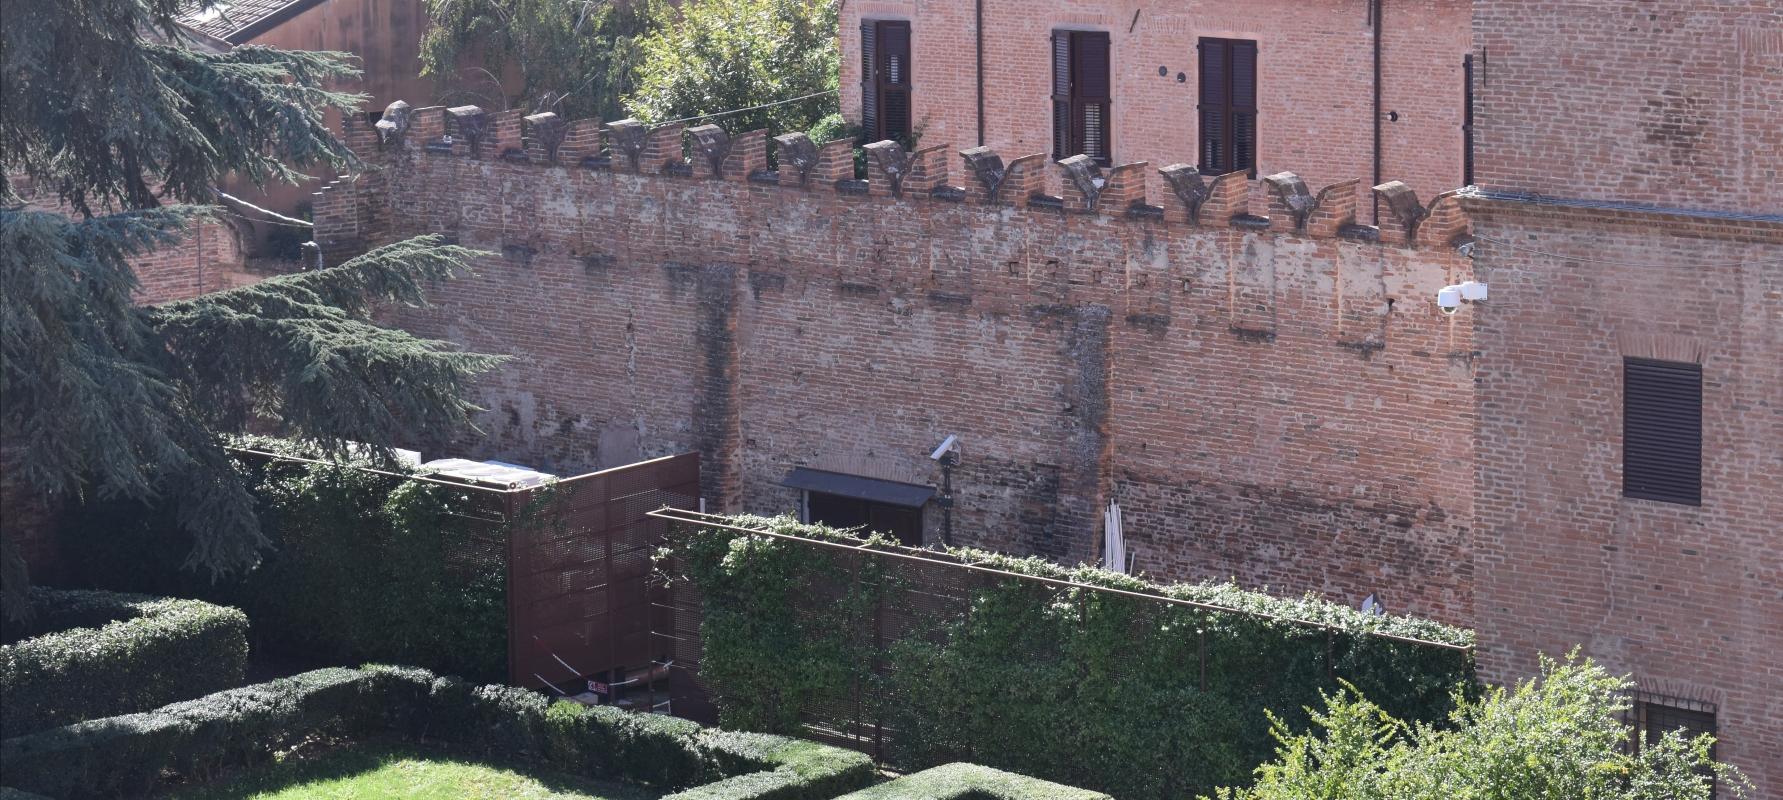 Palazzo Costabili (Ferrara) - Giardino 01 - Nicola Quirico - Ferrara (FE)